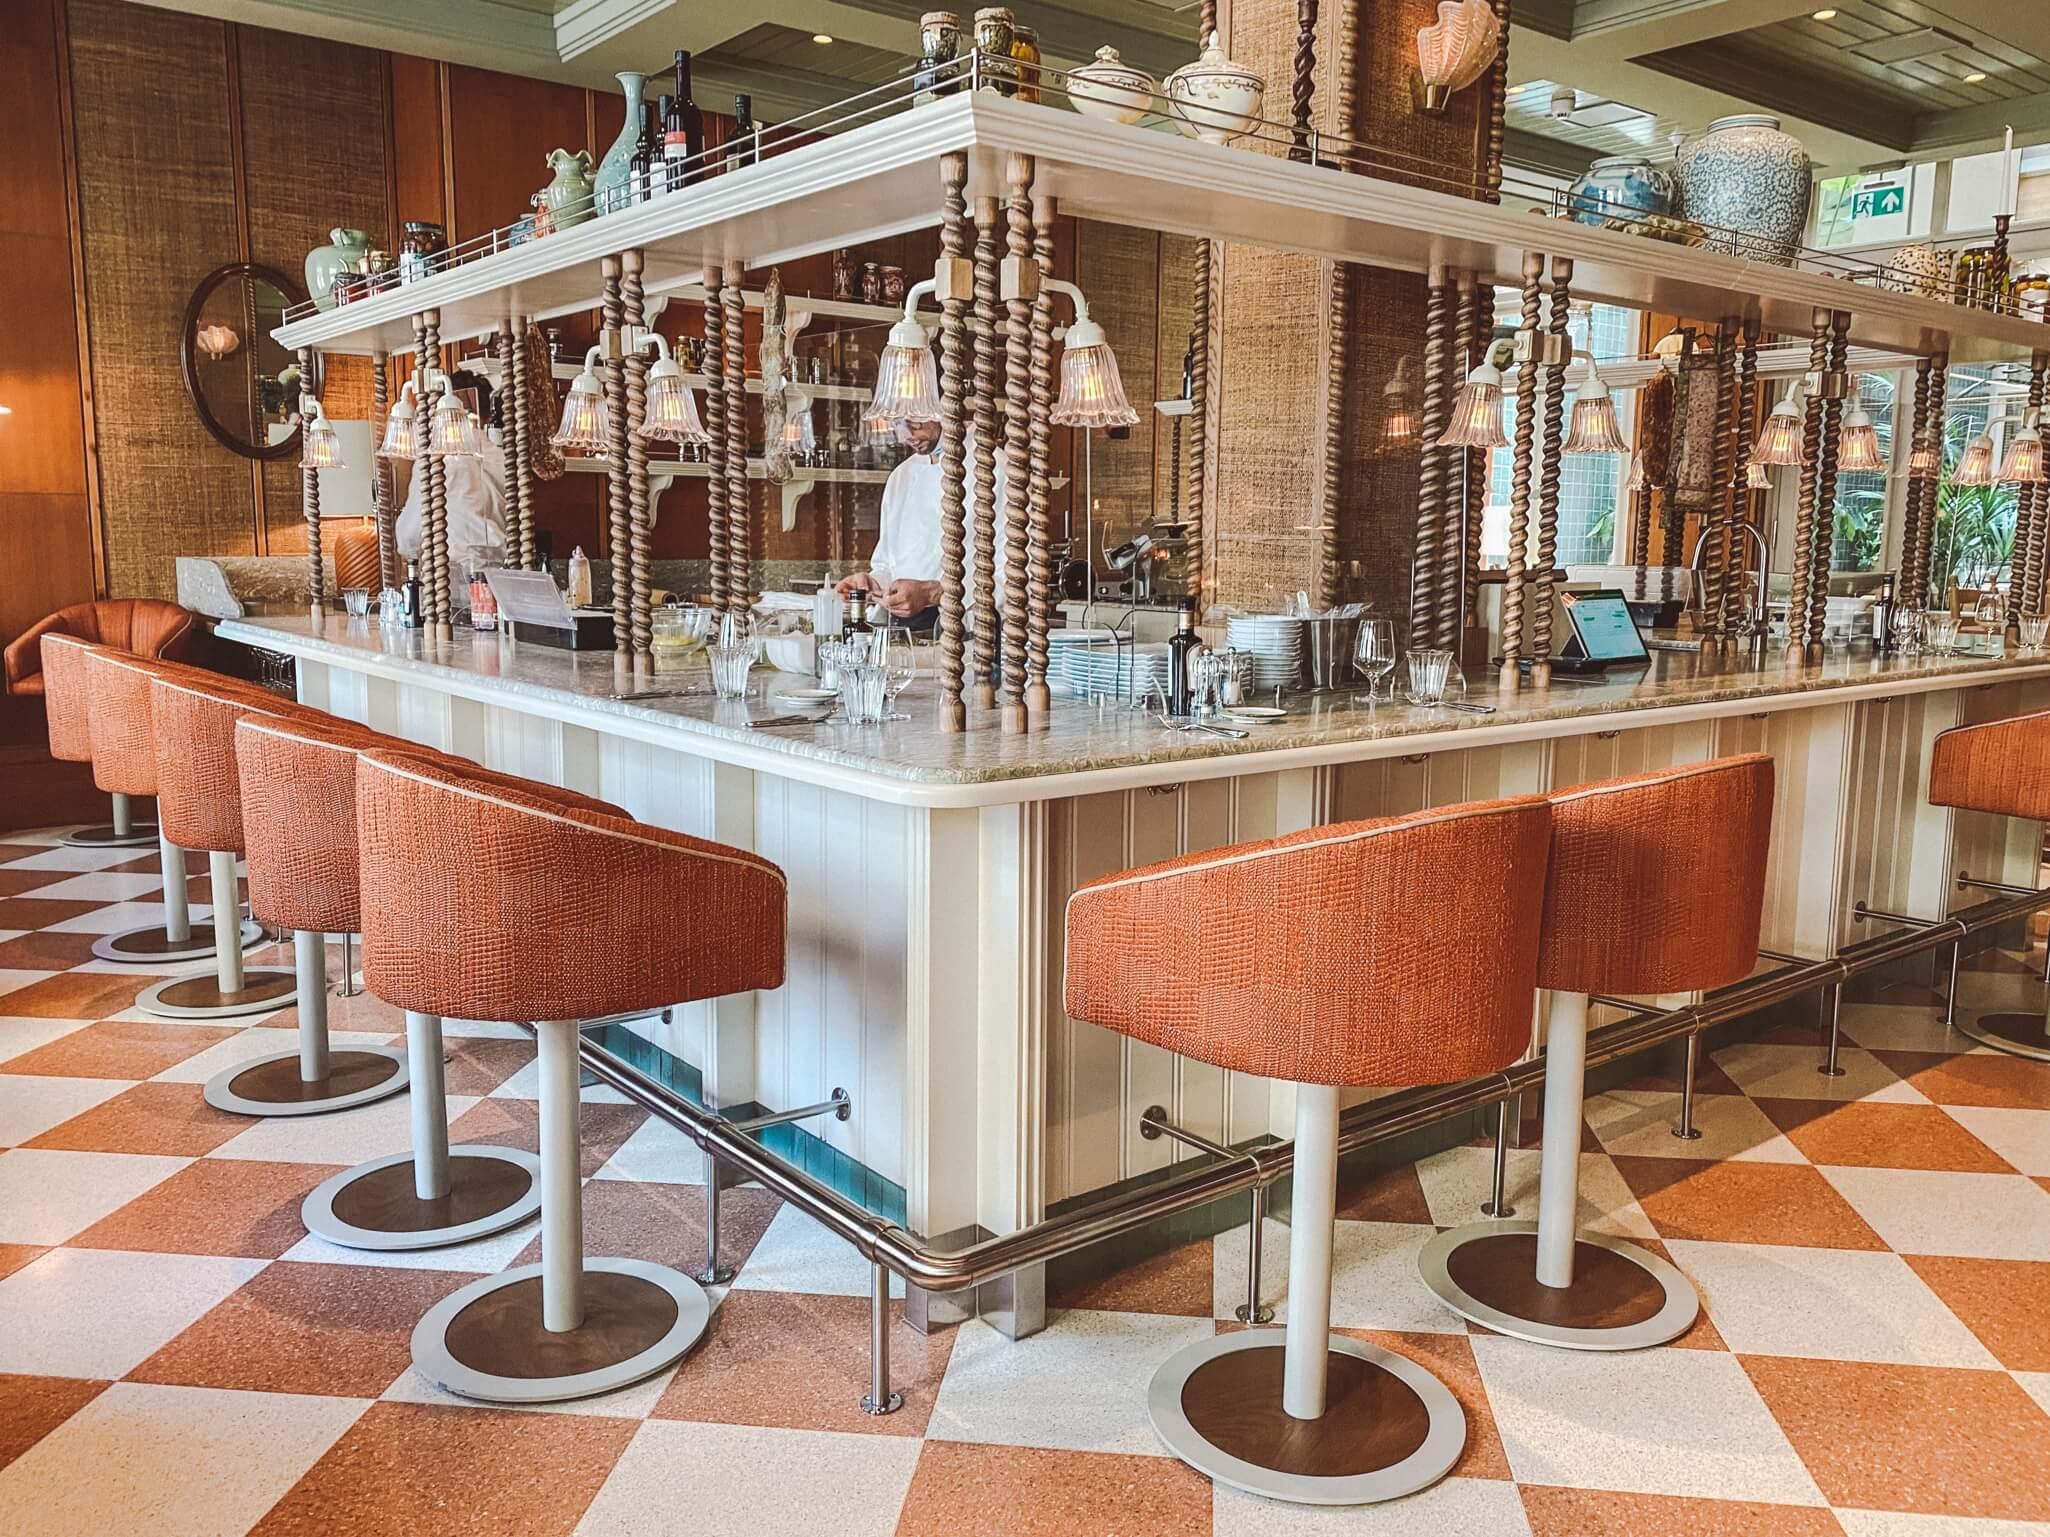 TRATTORIA GRAZIELLA AMSTERDAM: LUNCHEN IN HET PRACHTIGE HOTEL DE L'EUROPE